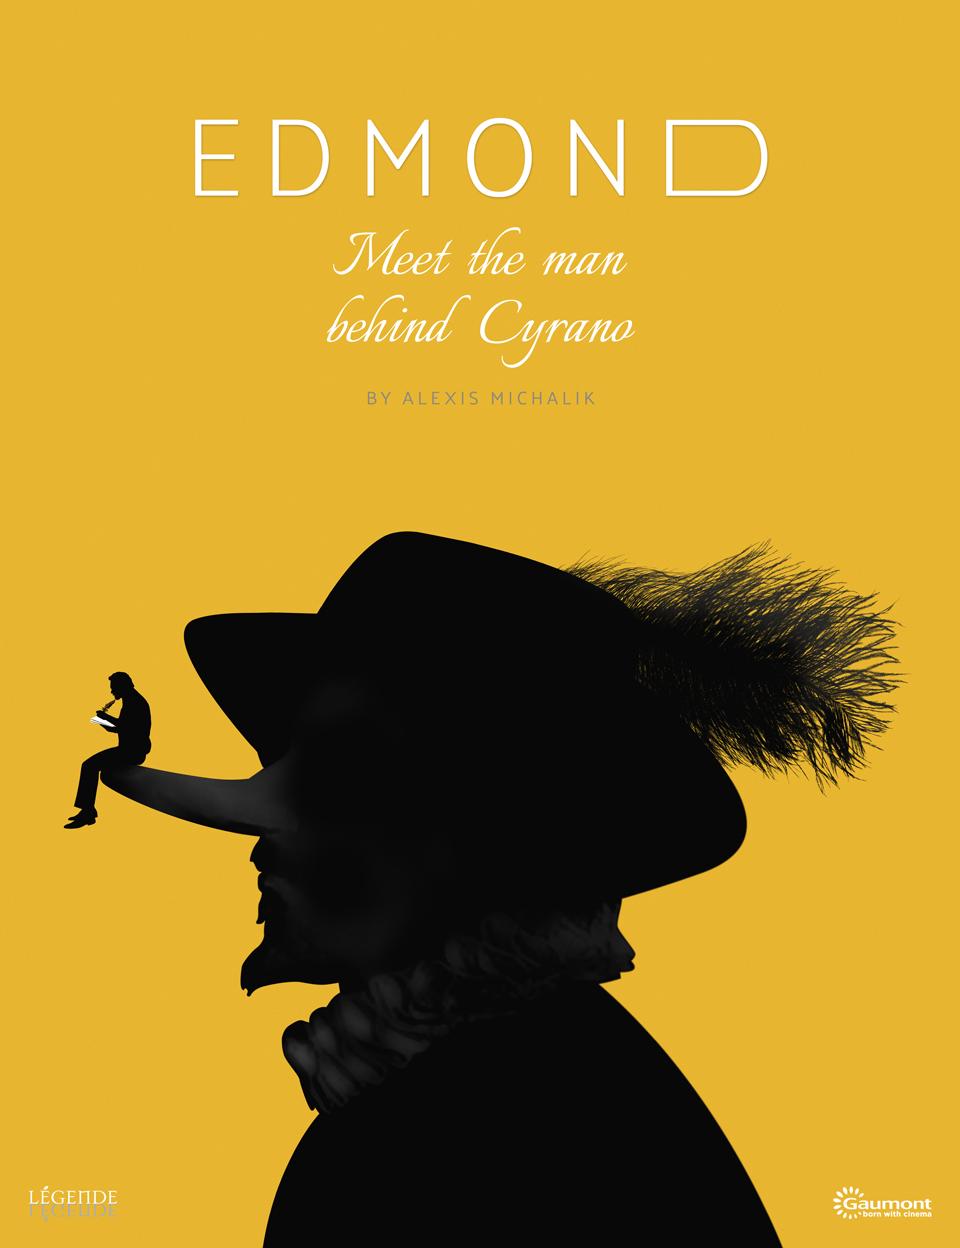 Edmond_100x130_Art2.jpg